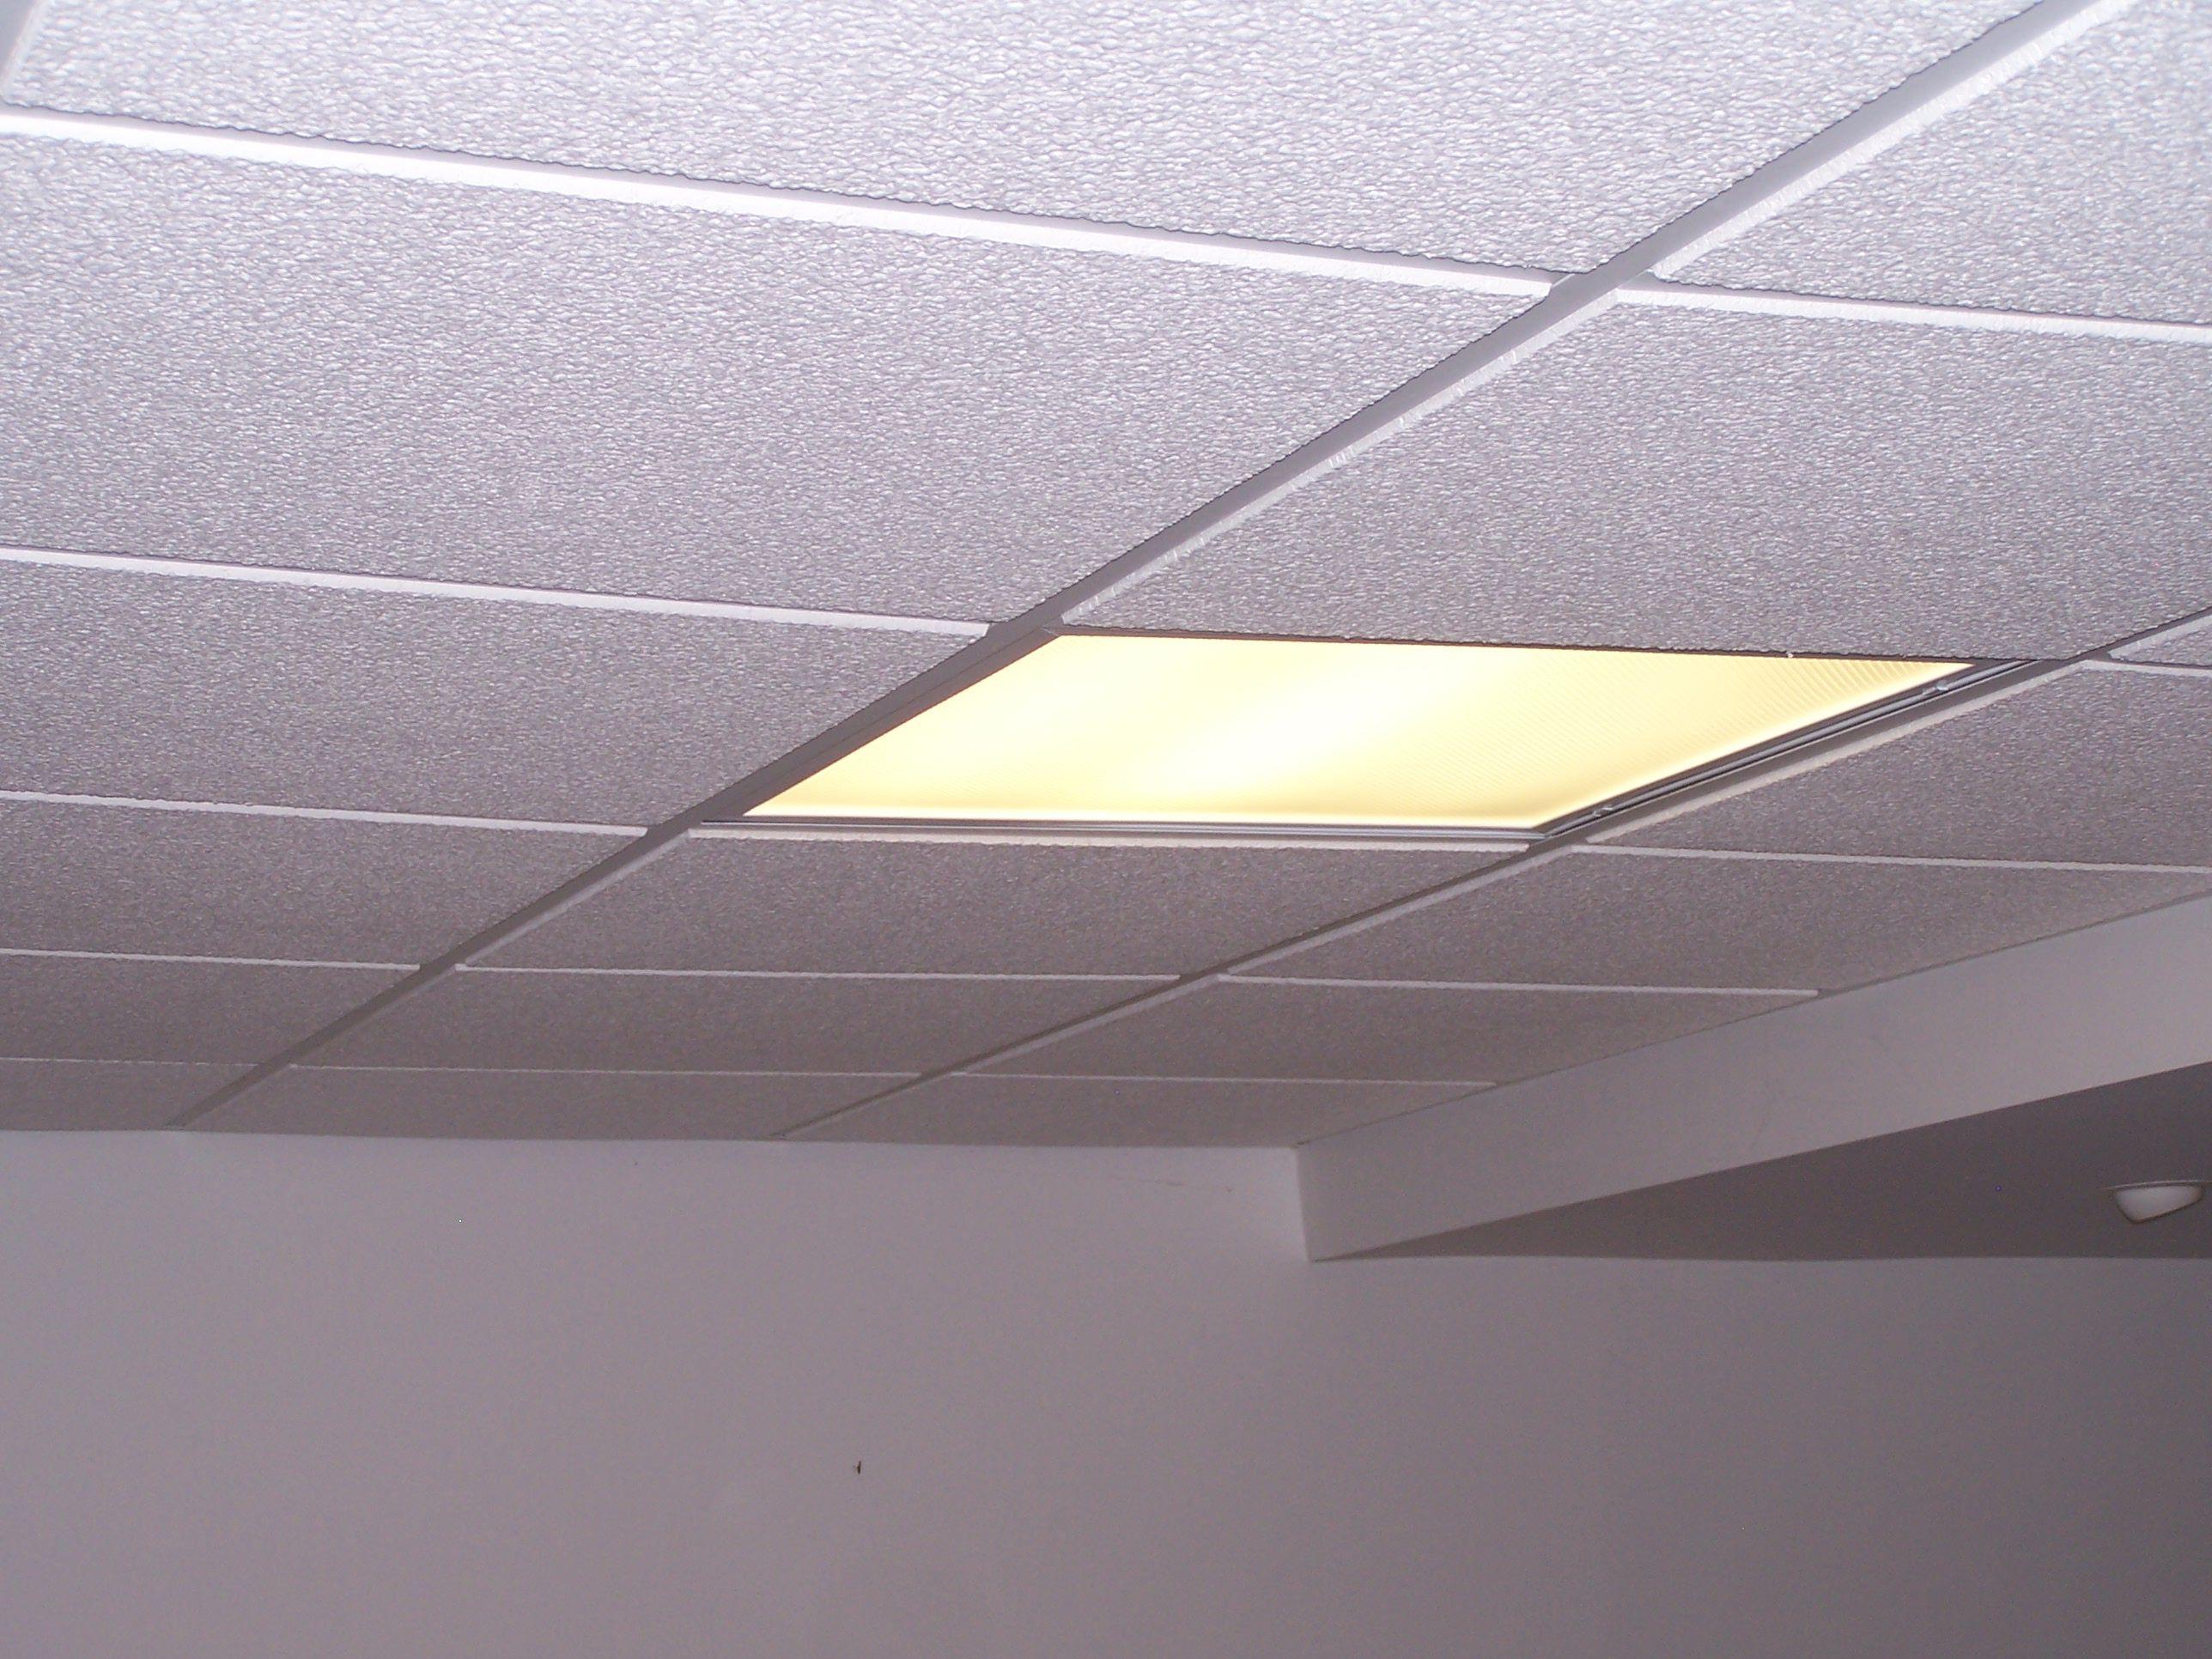 Drop ceiling fluorescent light fixtures 22 http drop ceiling fluorescent light fixtures 22 mozeypictures Images